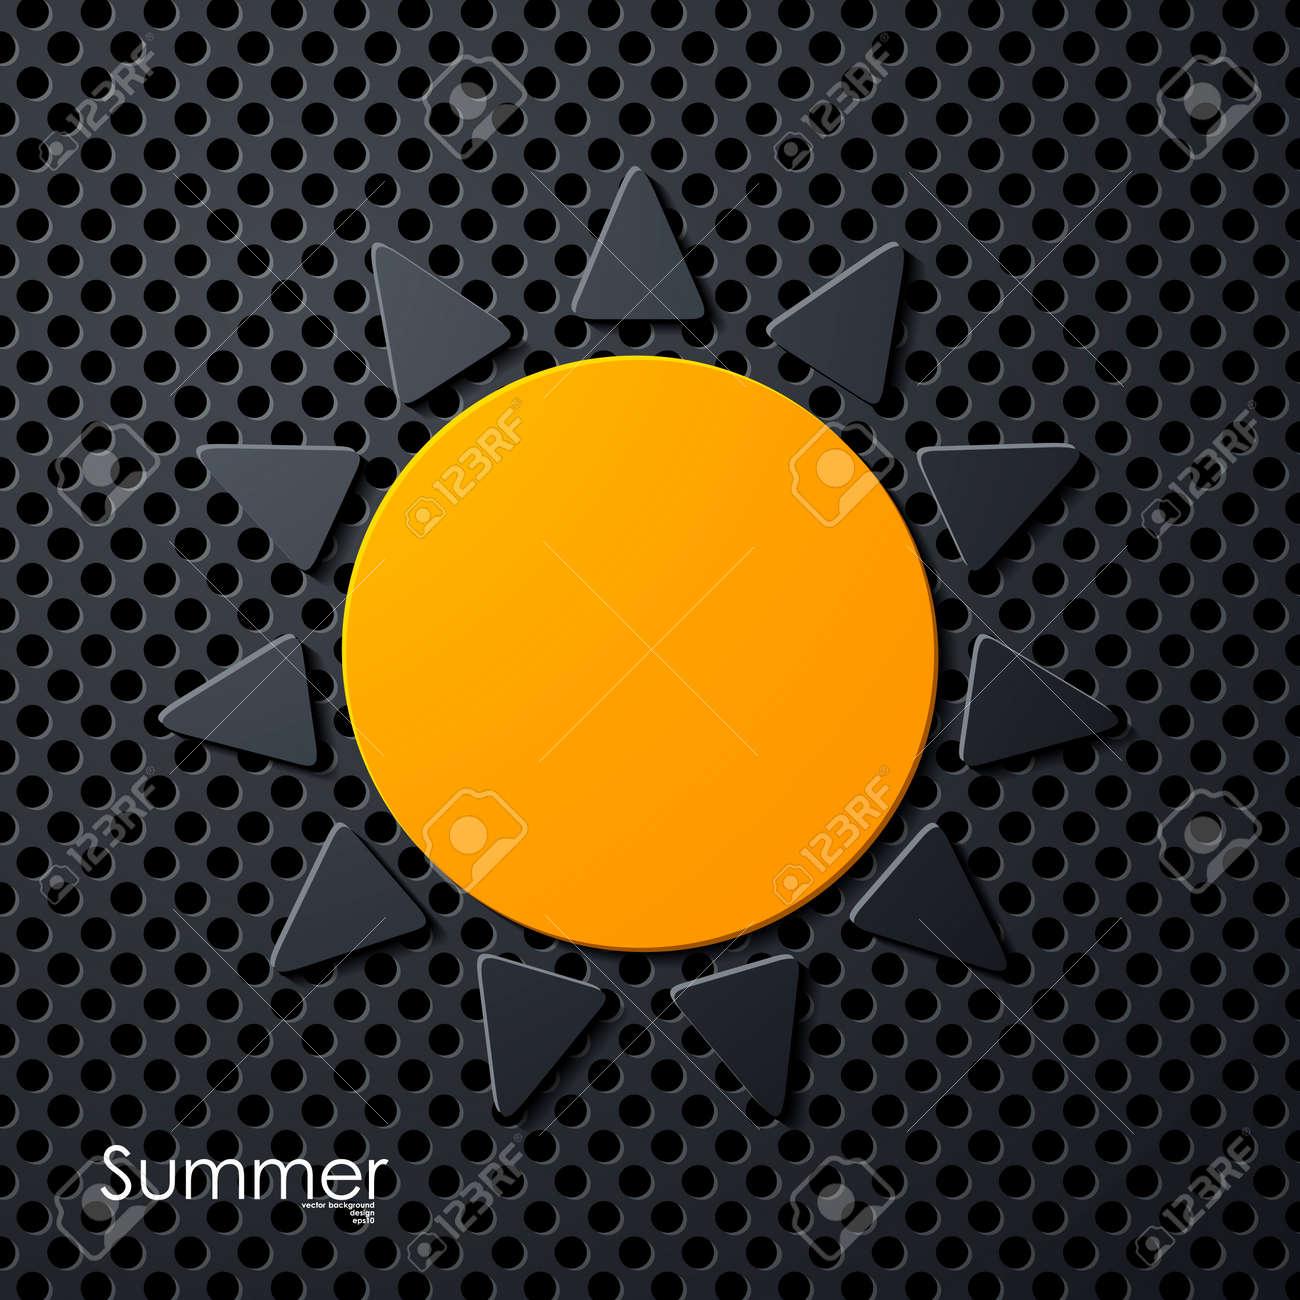 summer sun icon Stock Vector - 24130347